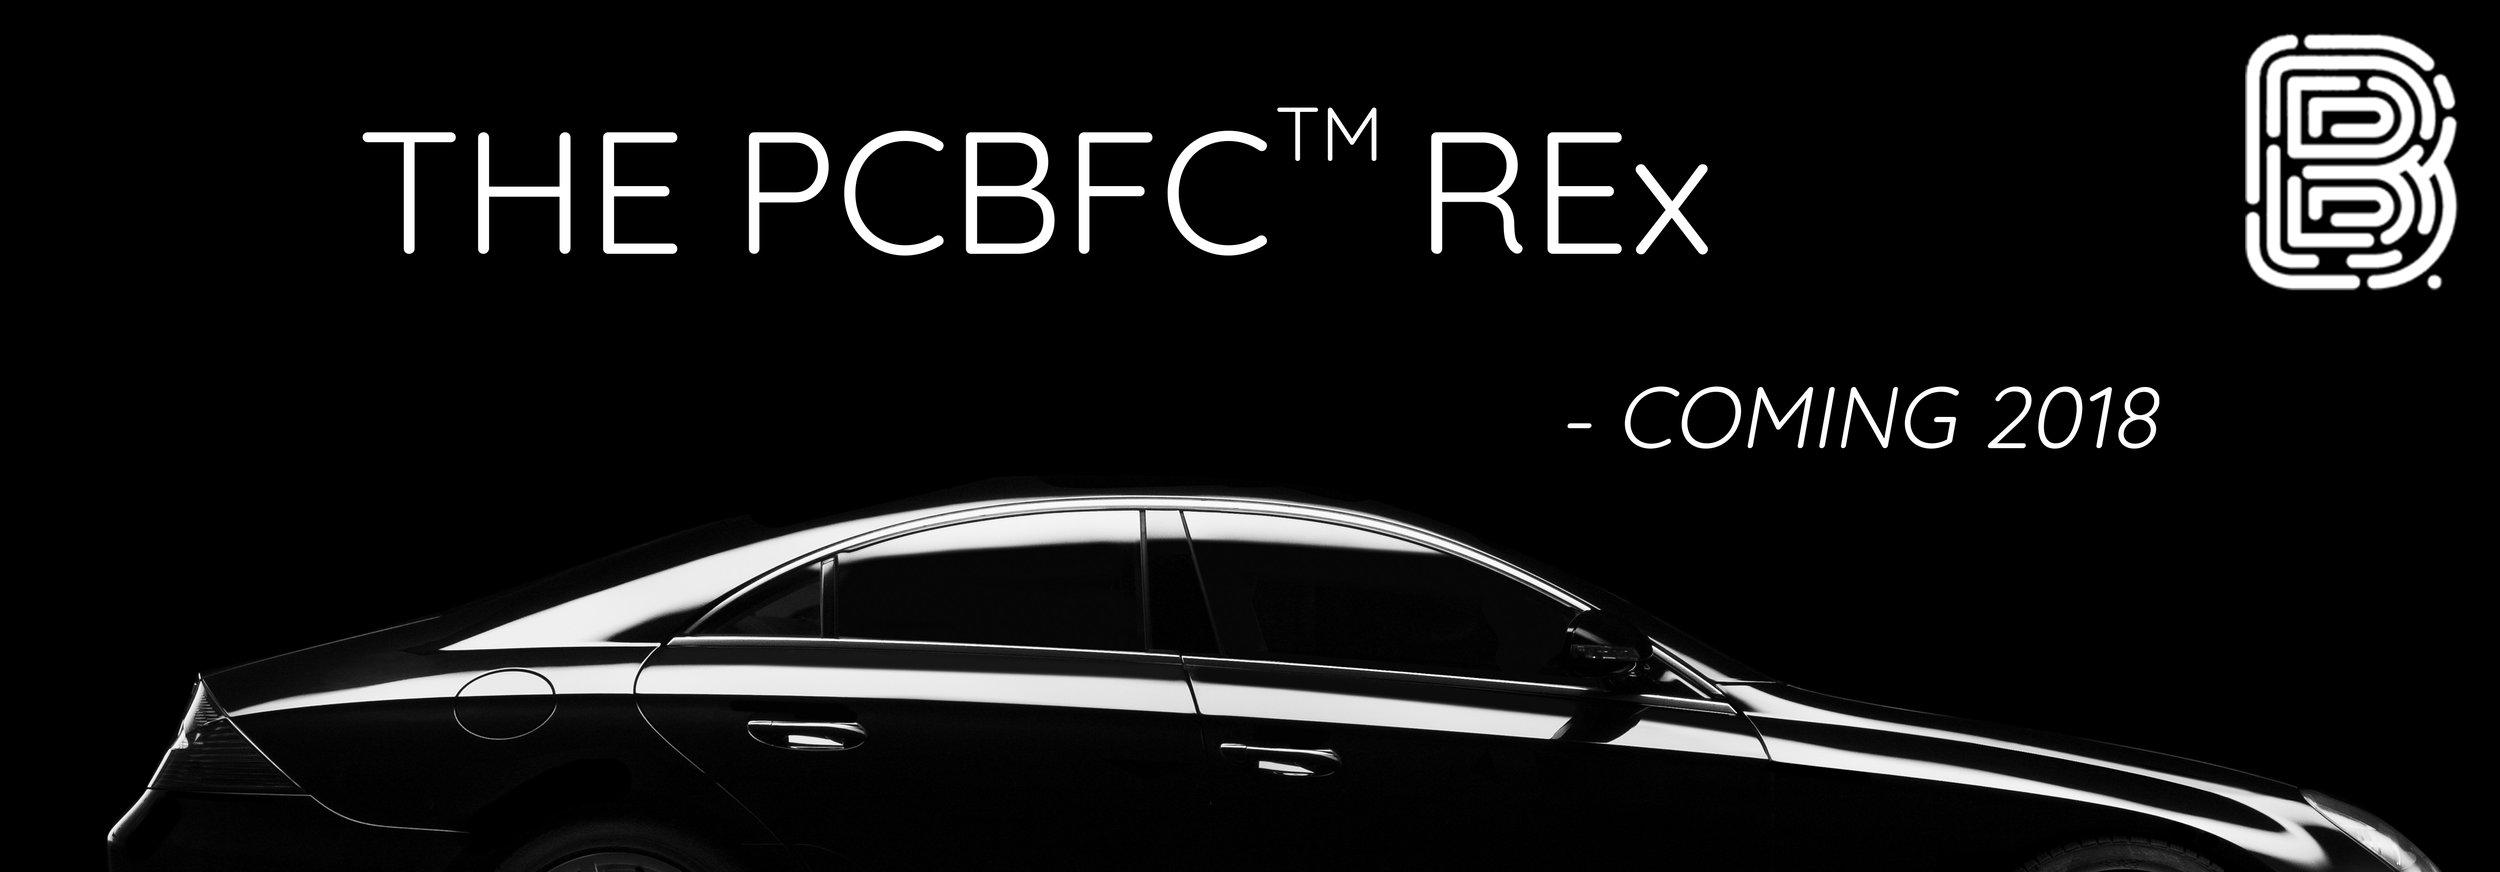 PCBFC REx.jpg